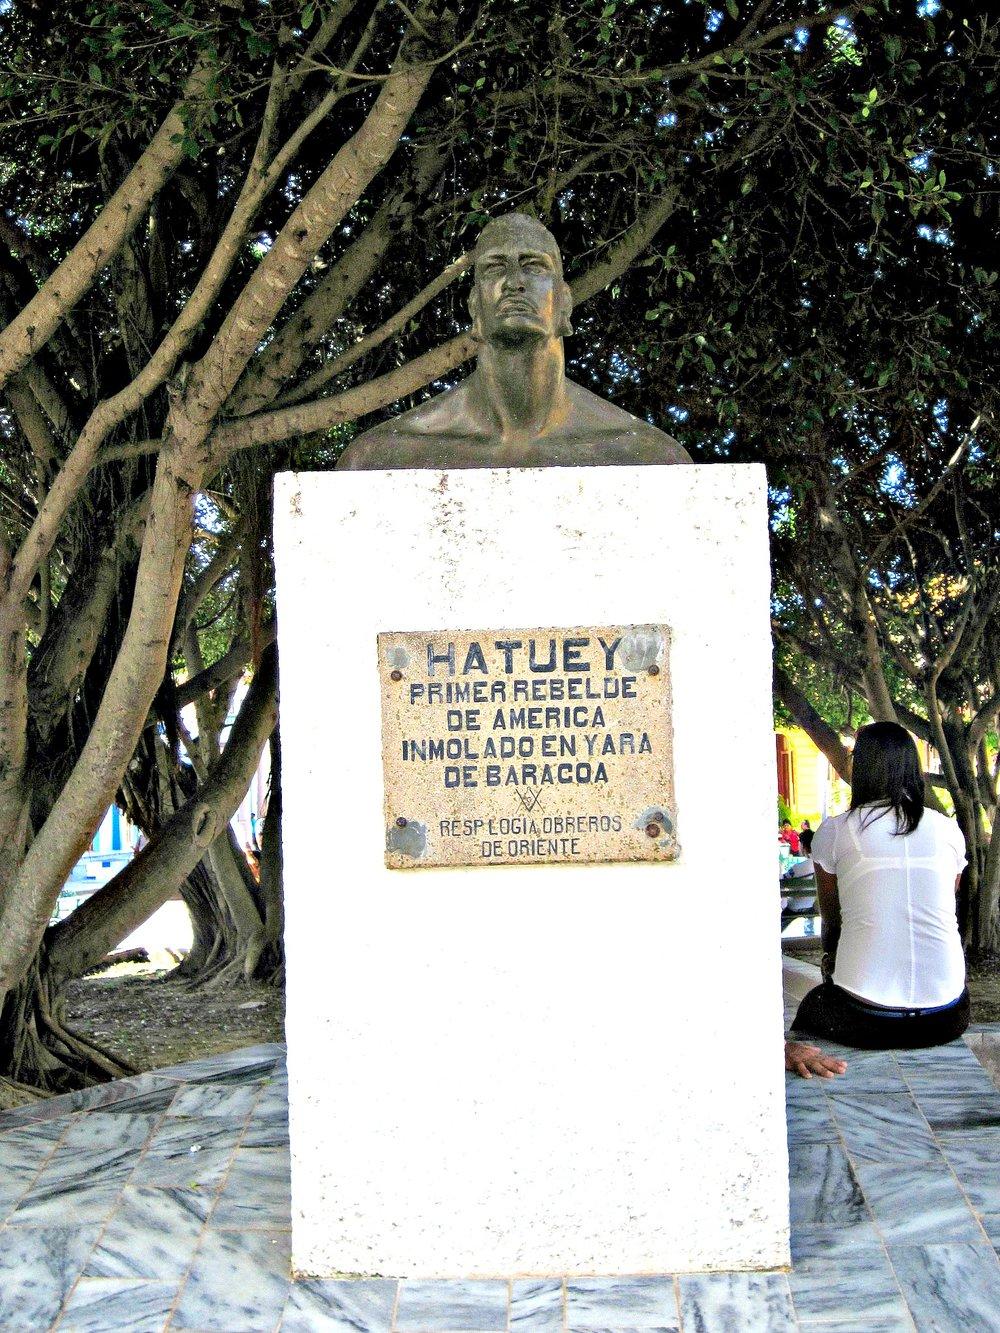 Hatuey: First Rebel of America